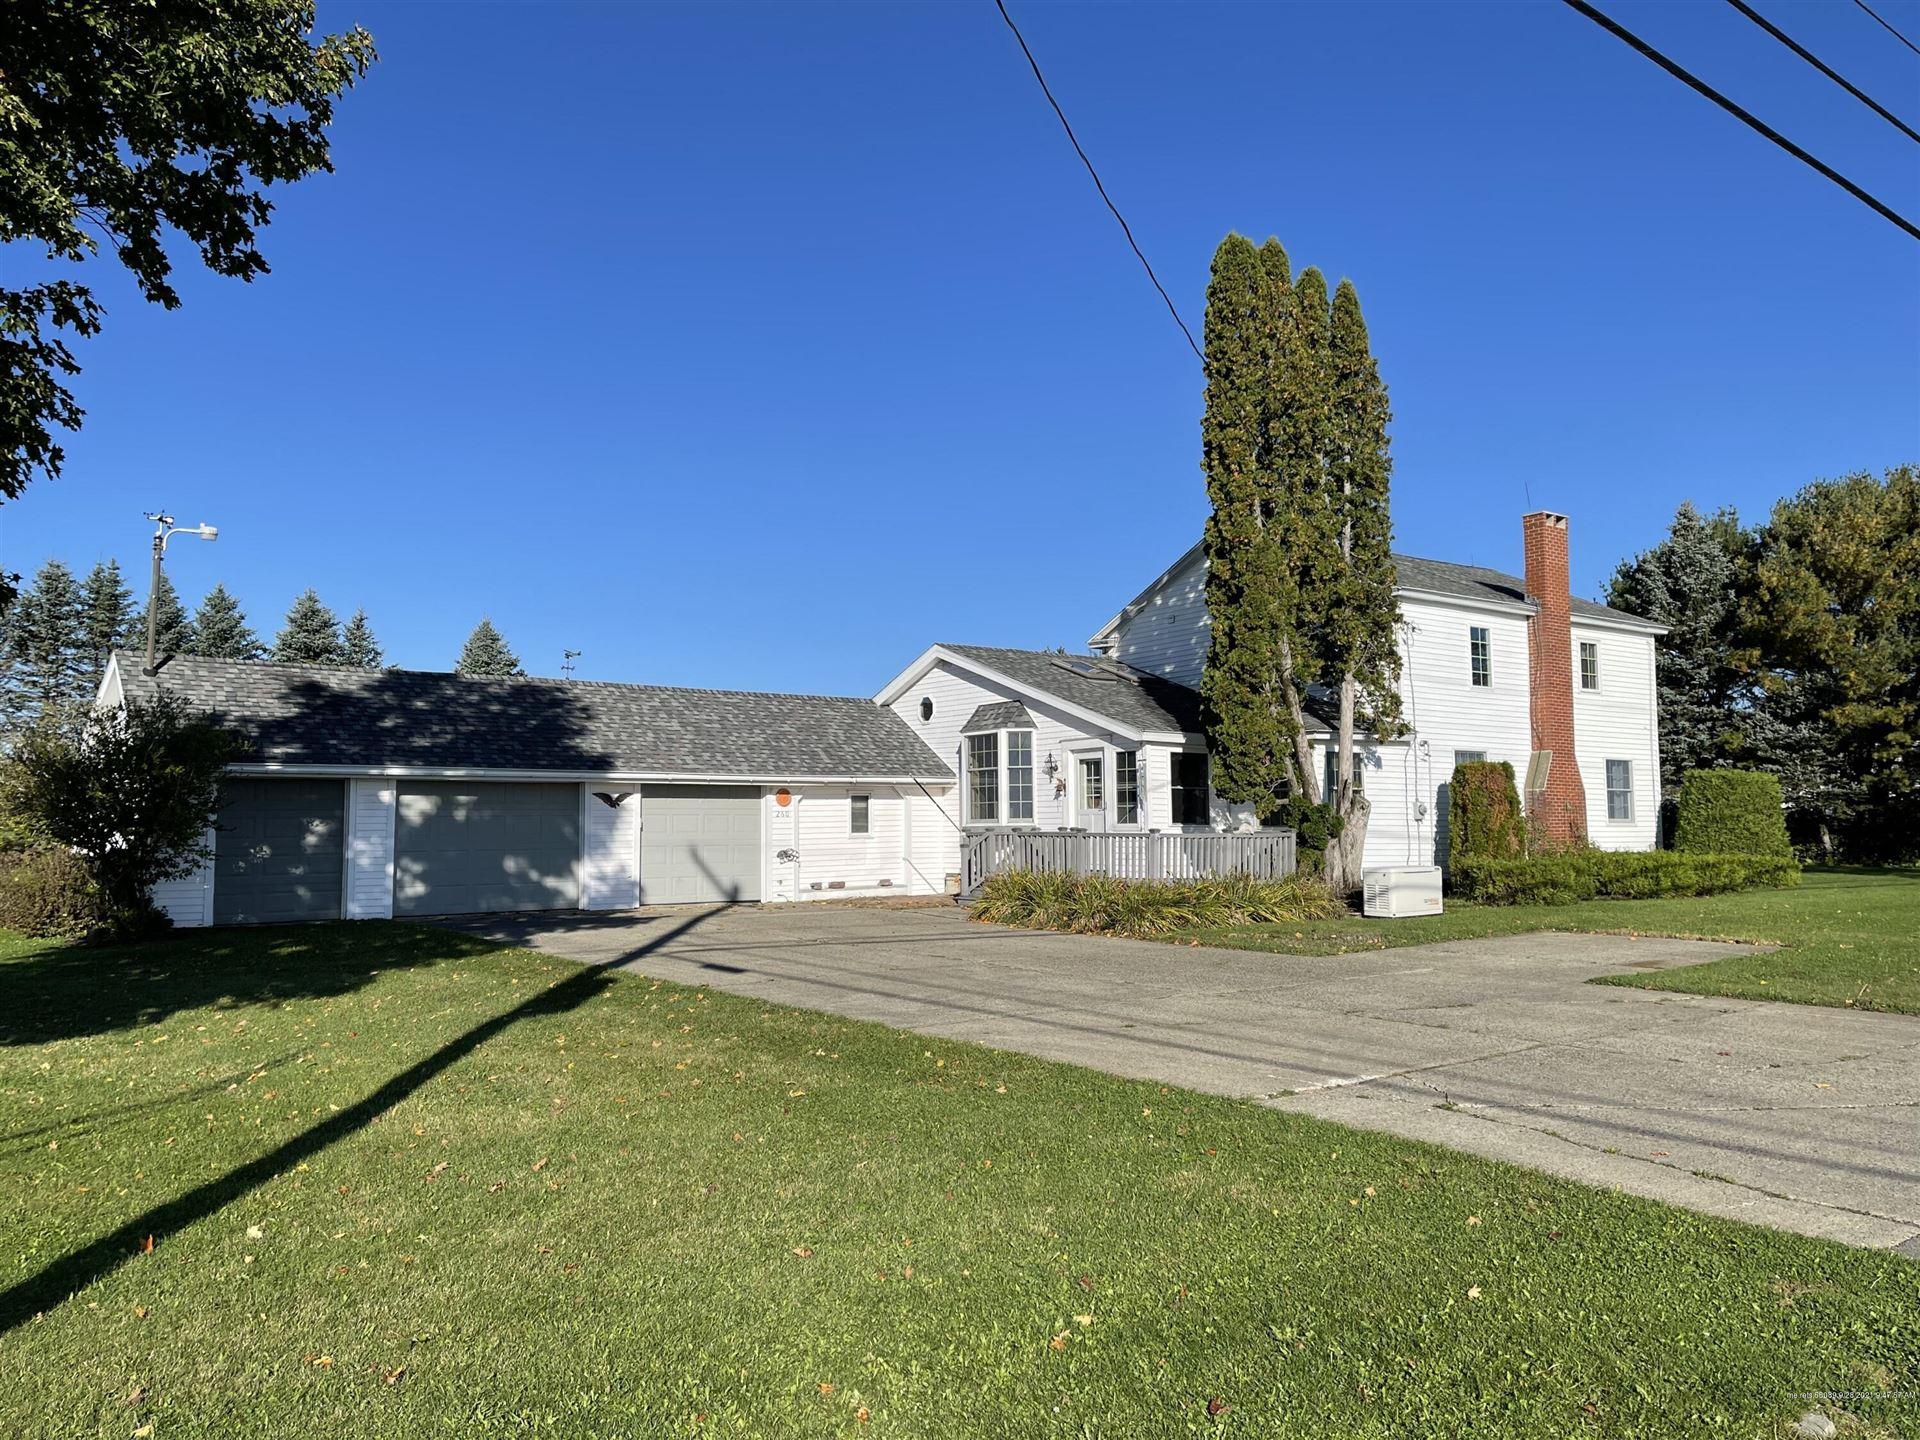 Photo of 260 Centerline Road, Presque Isle, ME 04769 (MLS # 1510352)